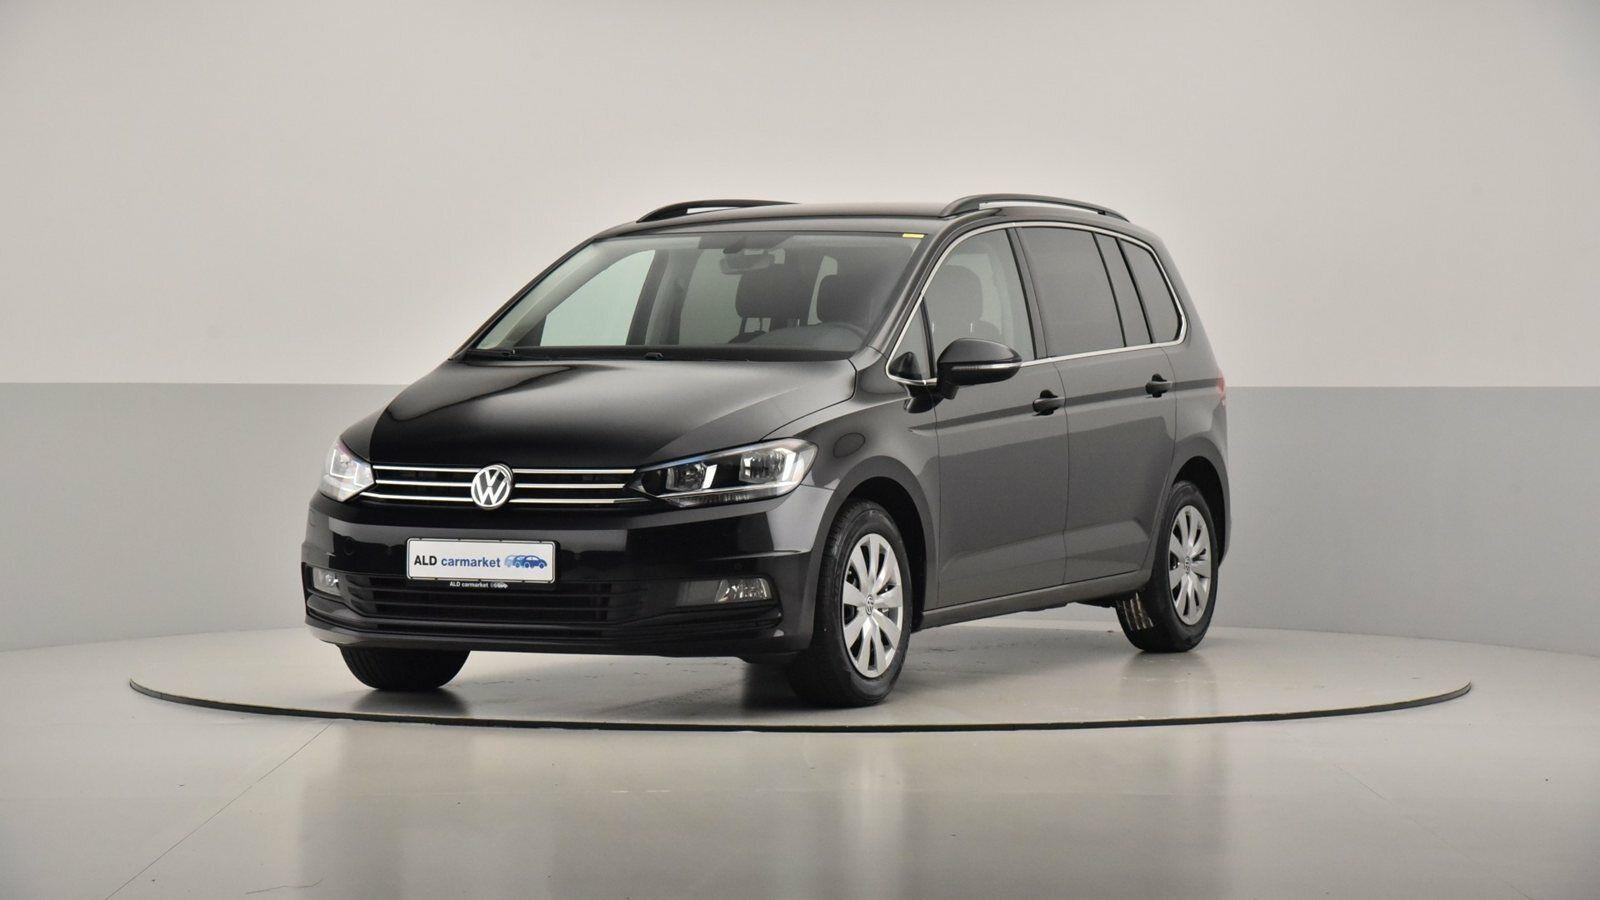 VW Touran 2,0 TDi 150 Comfortline DSG BMT 5d - 327.000 kr.